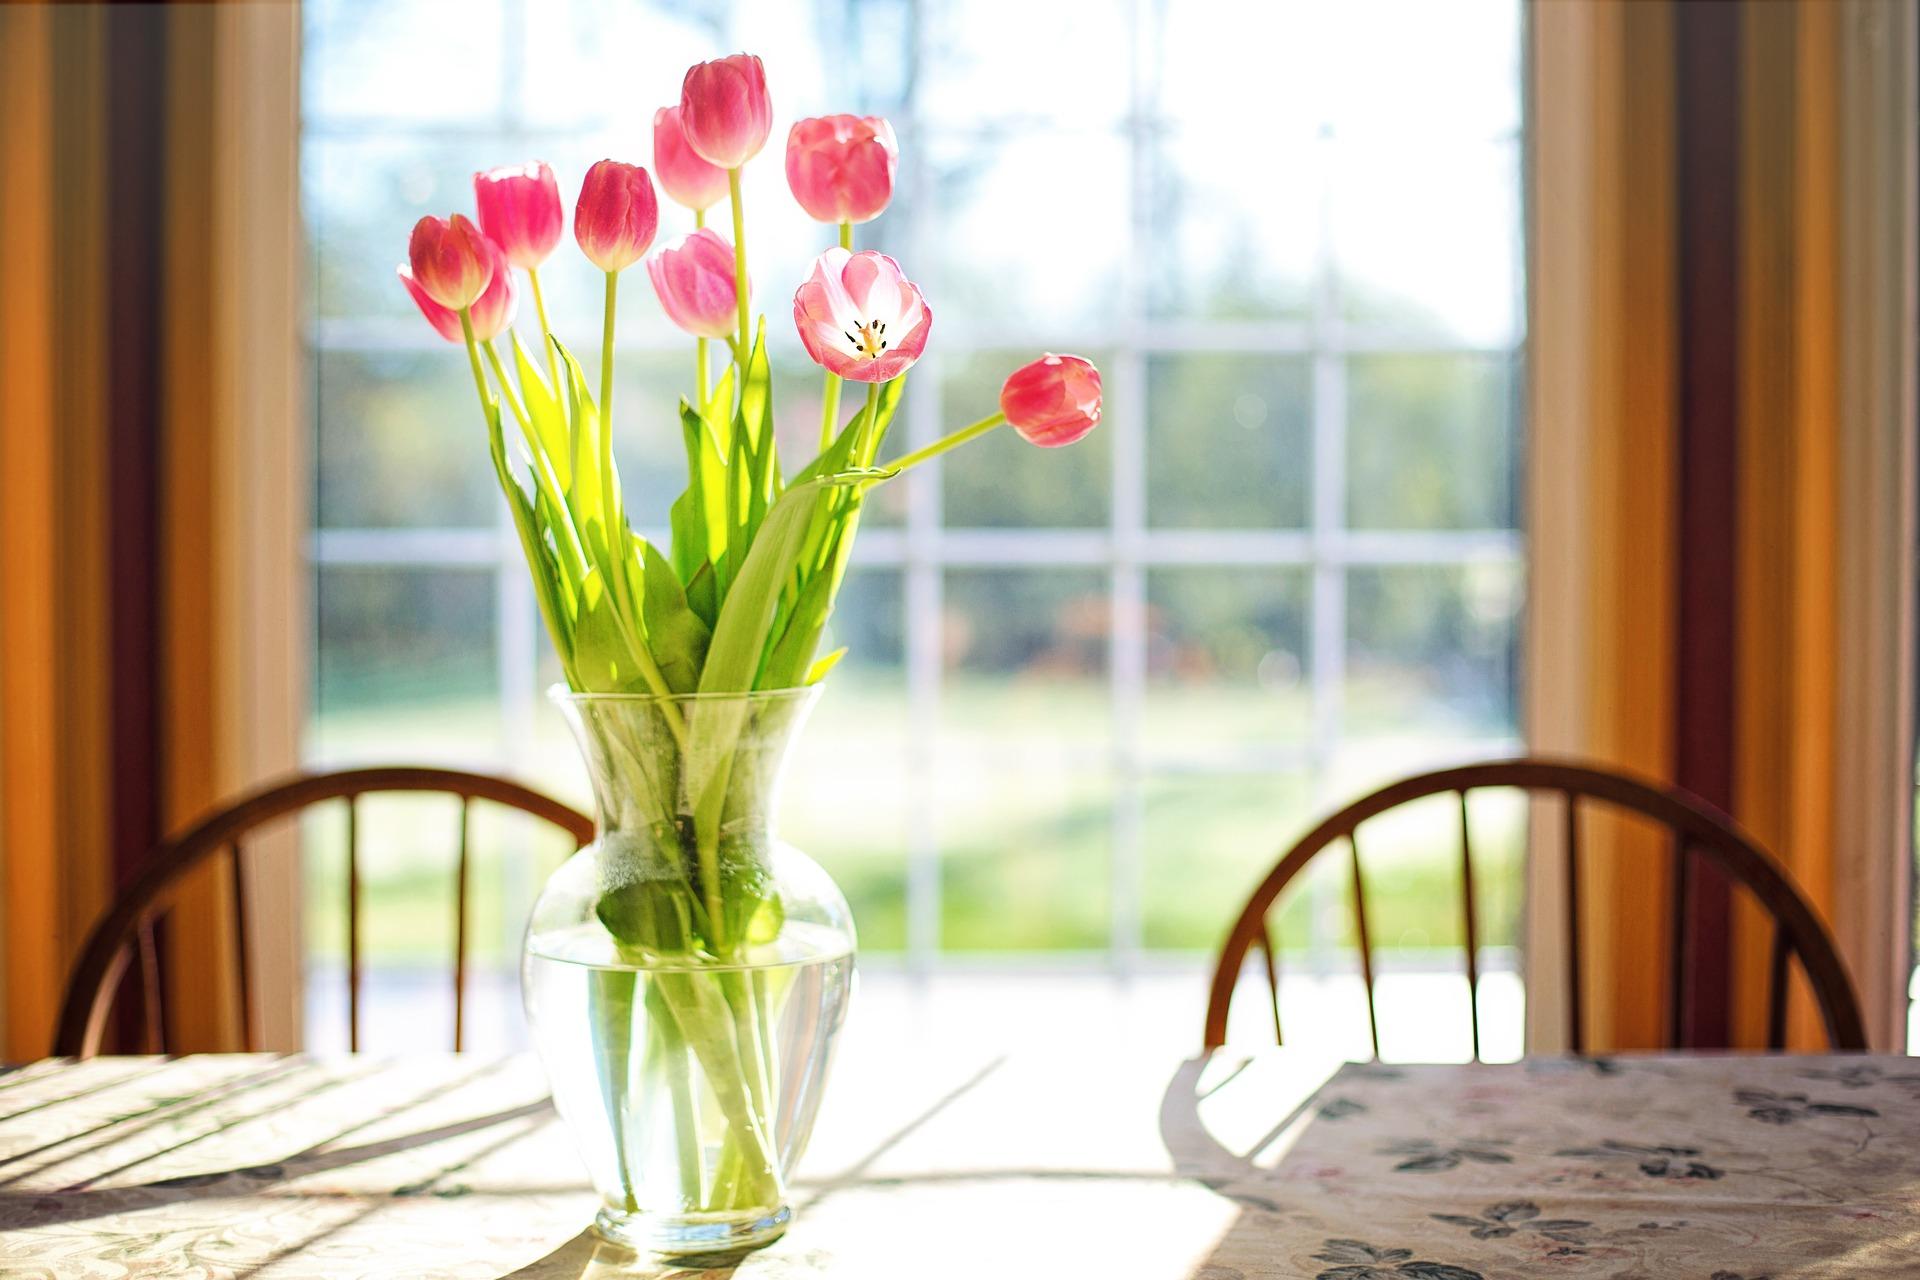 tulips-2239234_1920.jpg